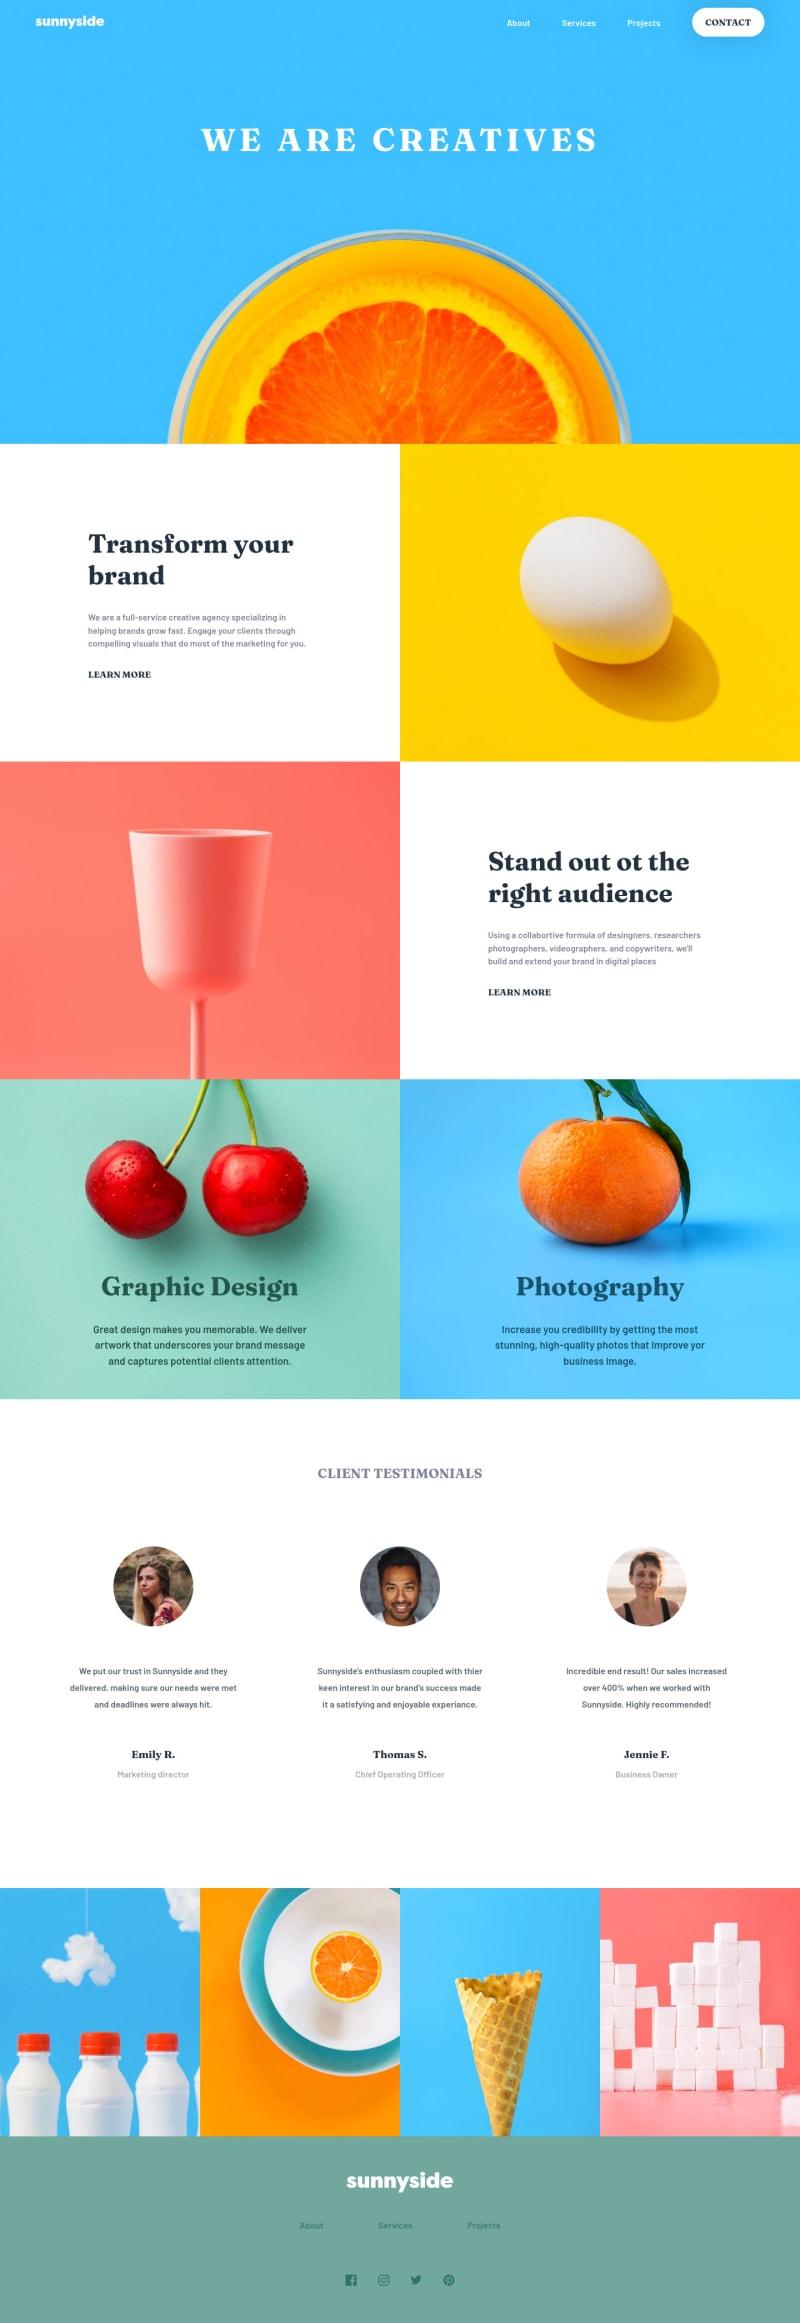 Desktop design screenshot for the Sunnyside agency landing page coding challenge